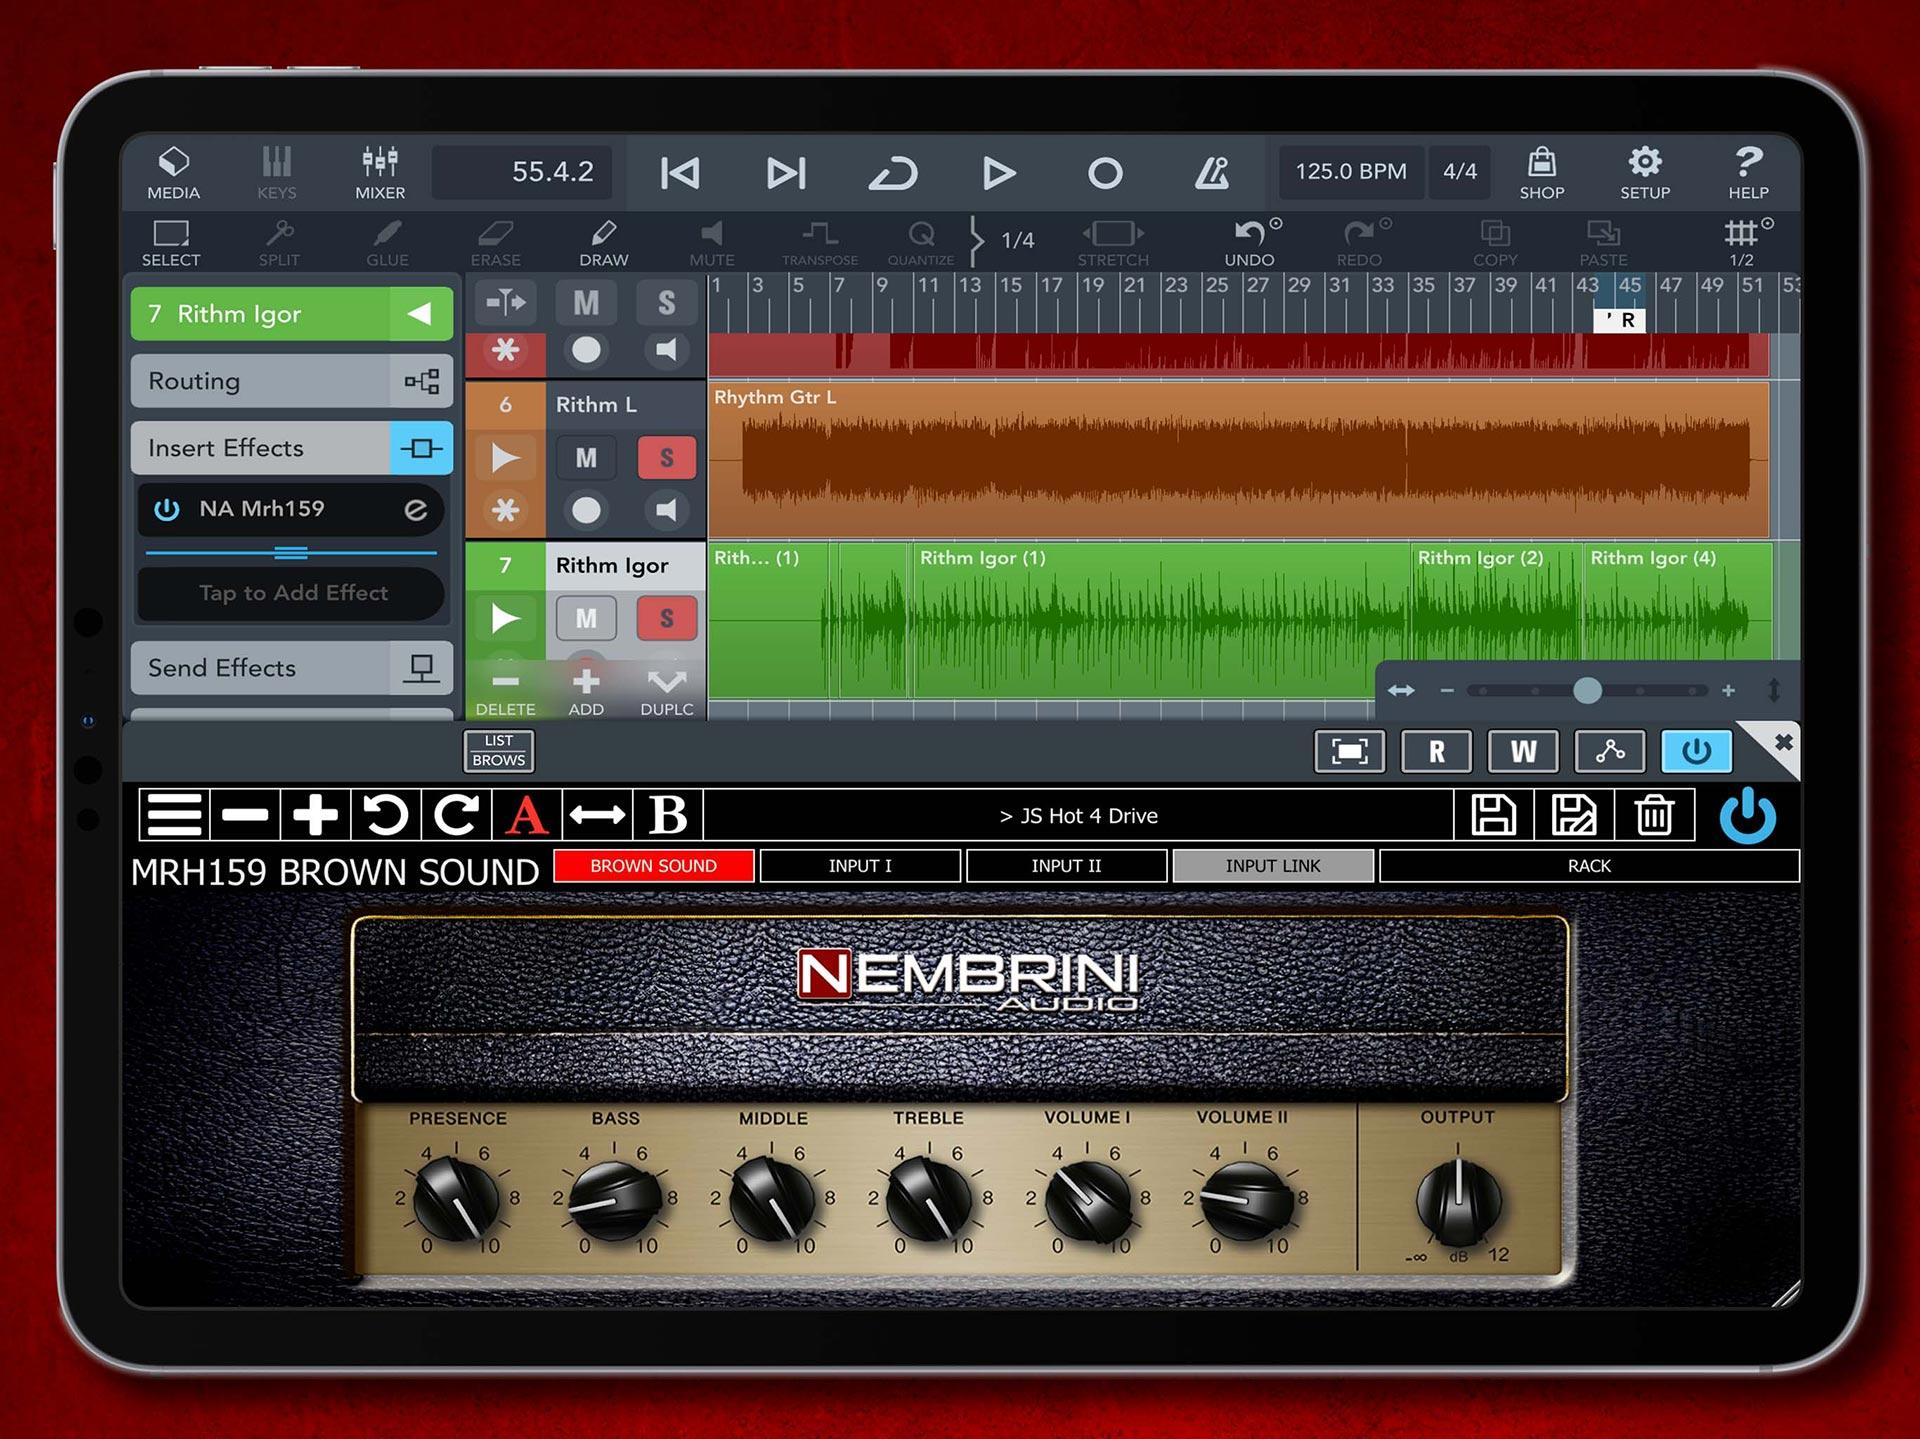 Nembrini Audio MRH-159 Brown Sound guitar amp plugin